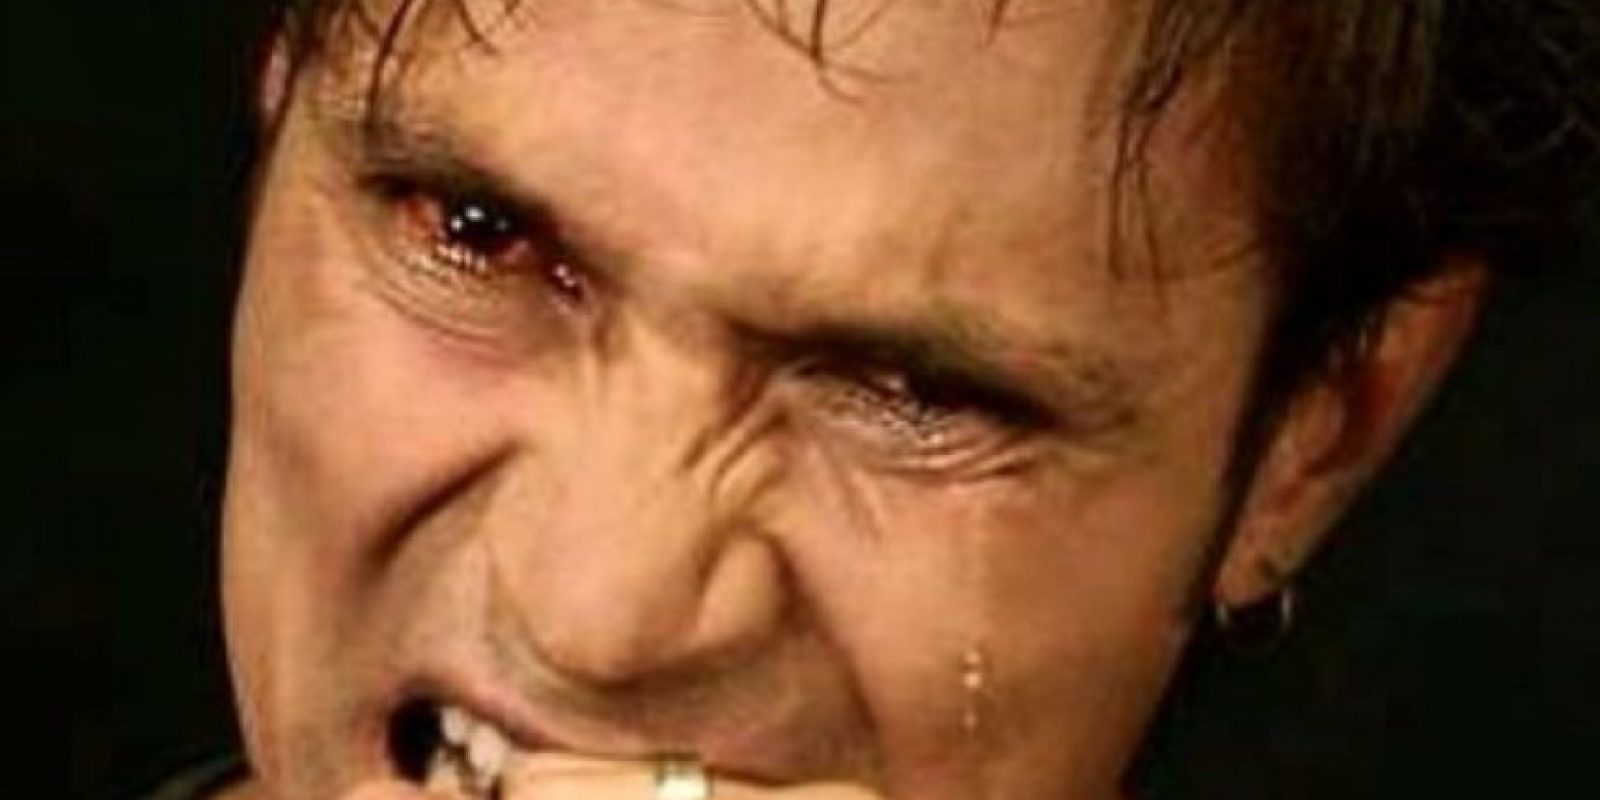 Ramiro Meneses Ya Tiene Un Nuevo Amor Publimetro Colombia